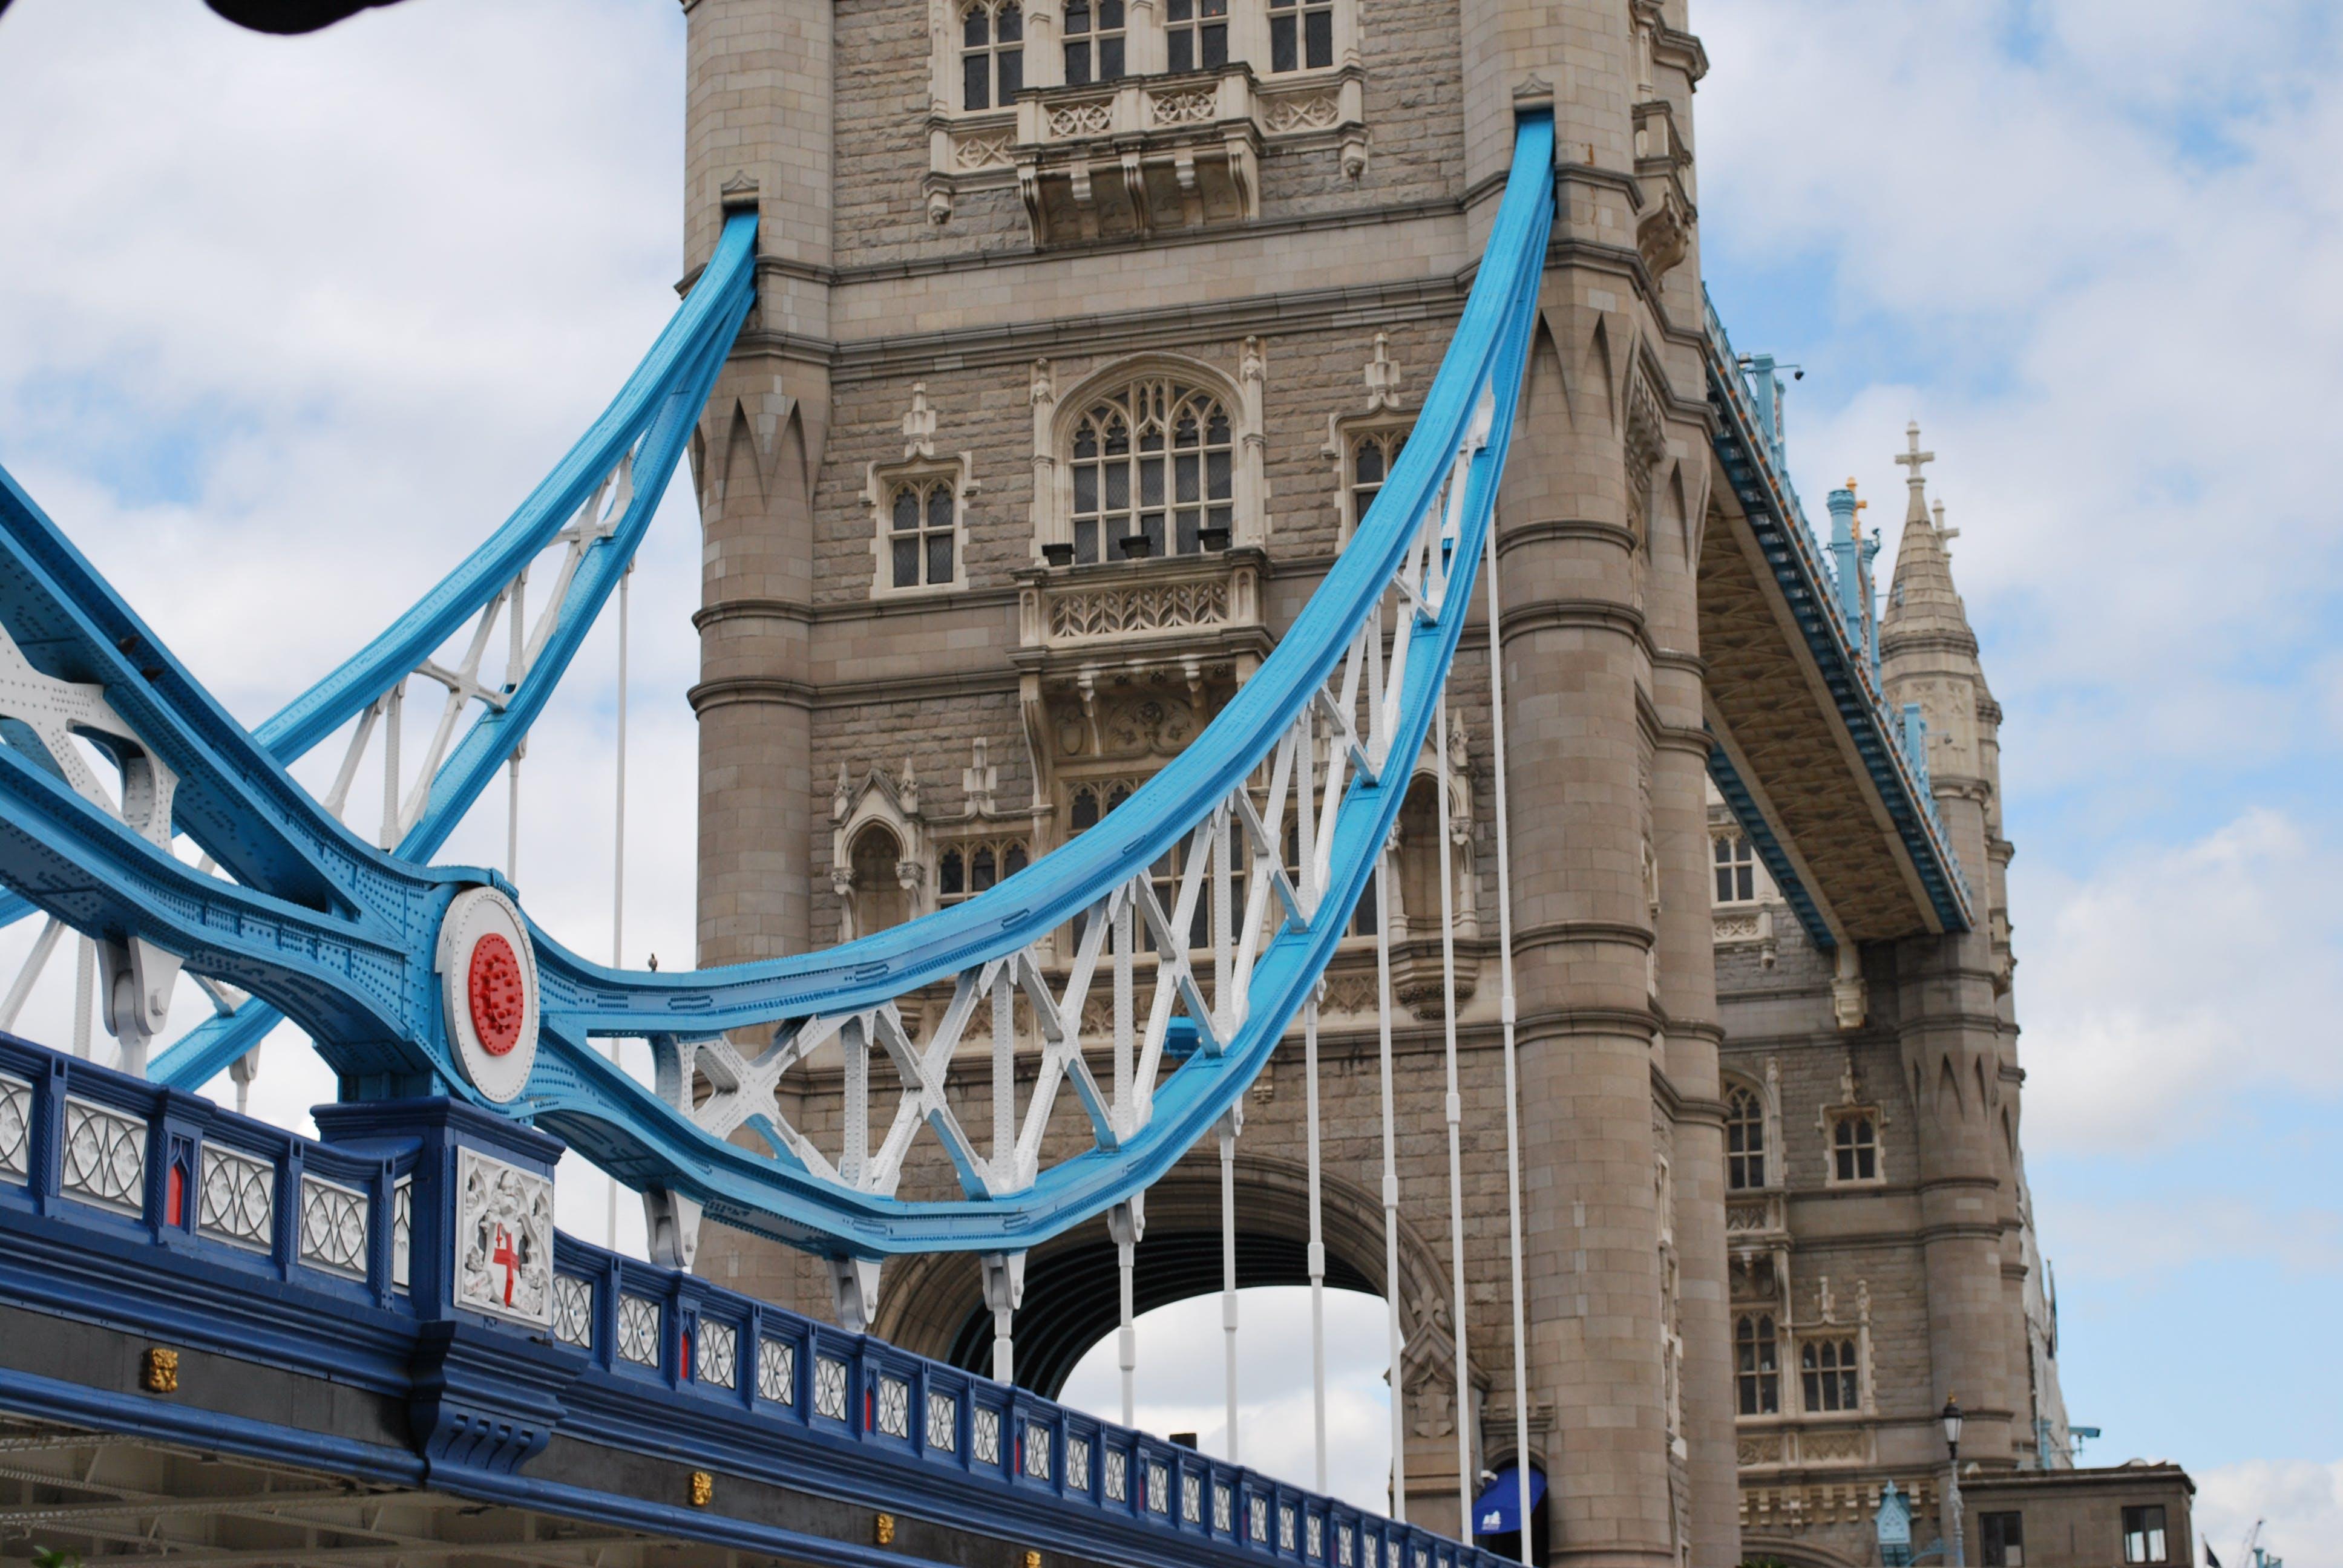 Gratis lagerfoto af Tower Bridge